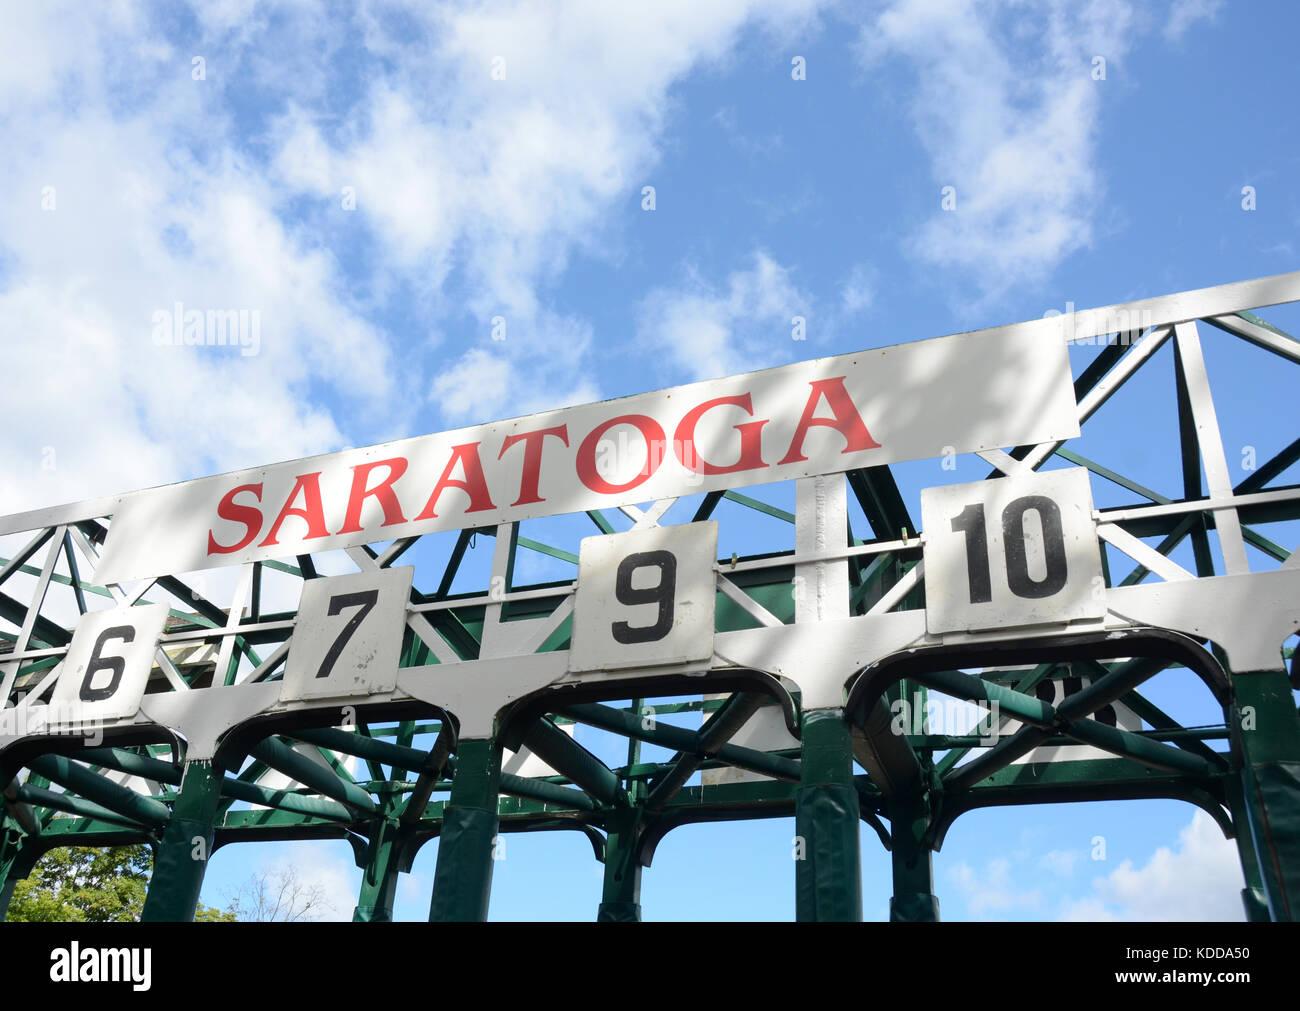 Horse race track gates in Saratoga - Stock Image